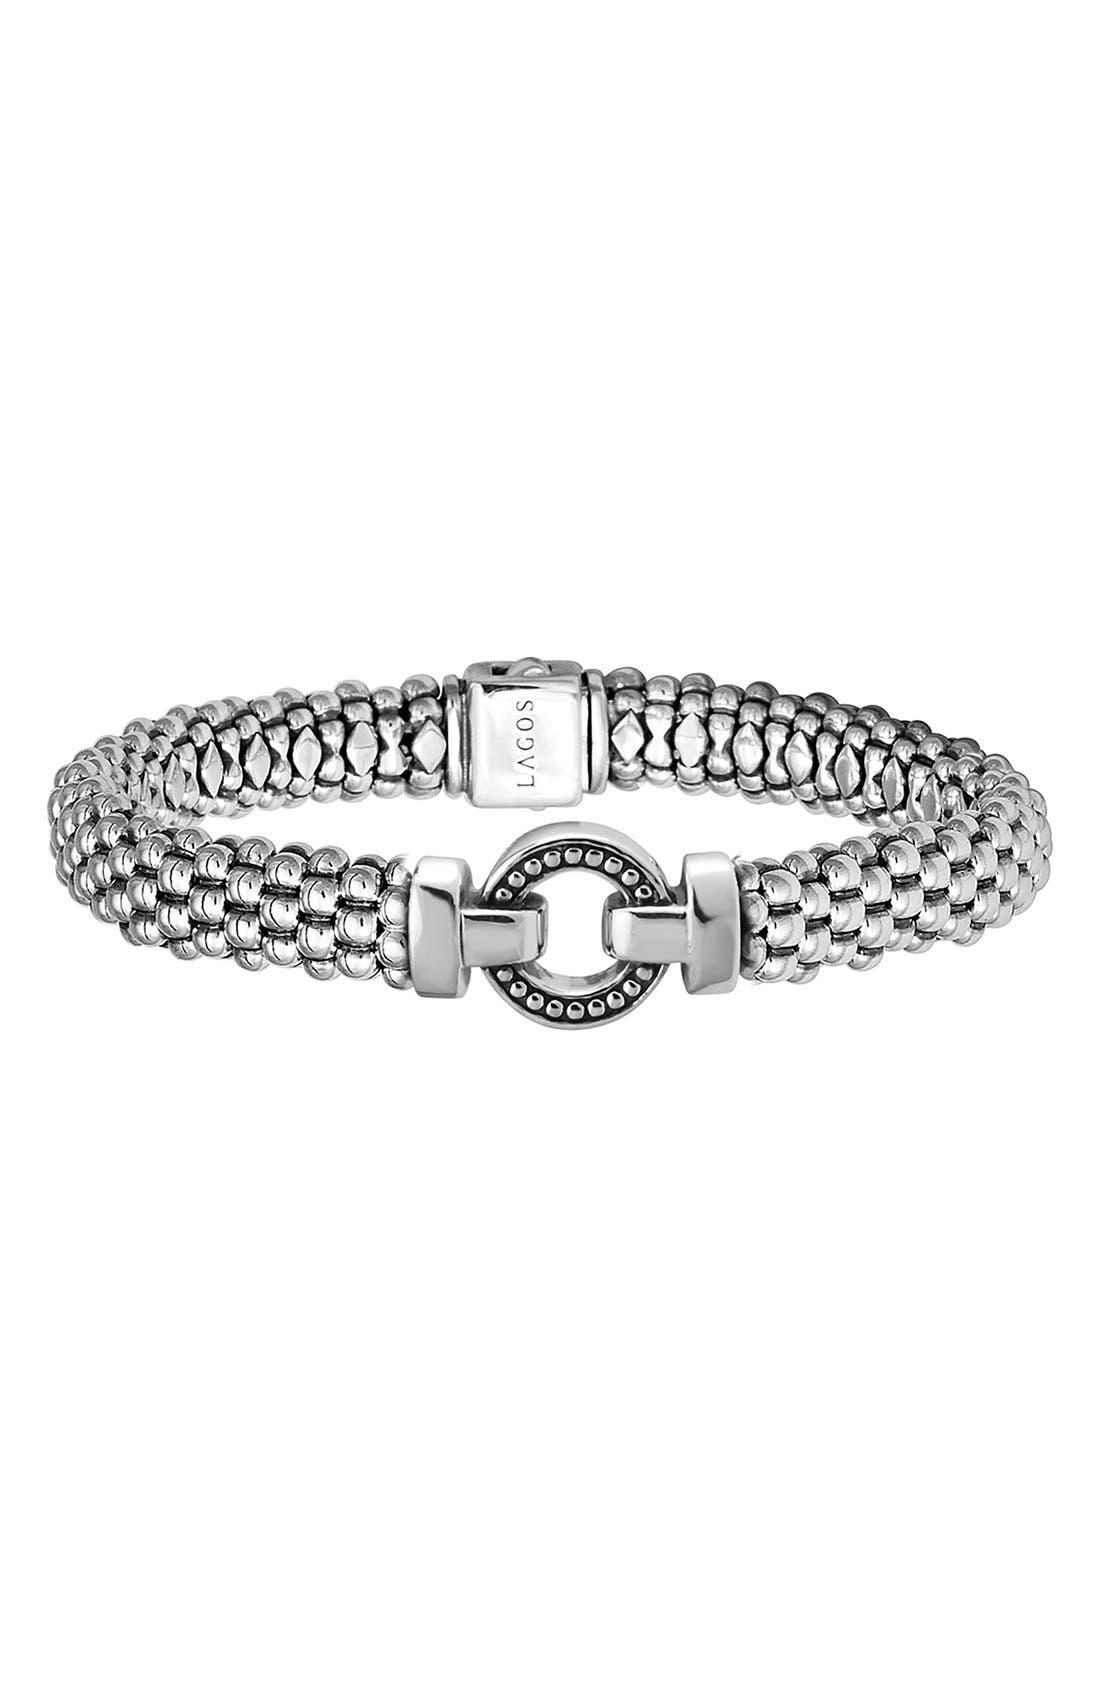 LAGOS 'Enso' Caviar™ Rope Bracelet